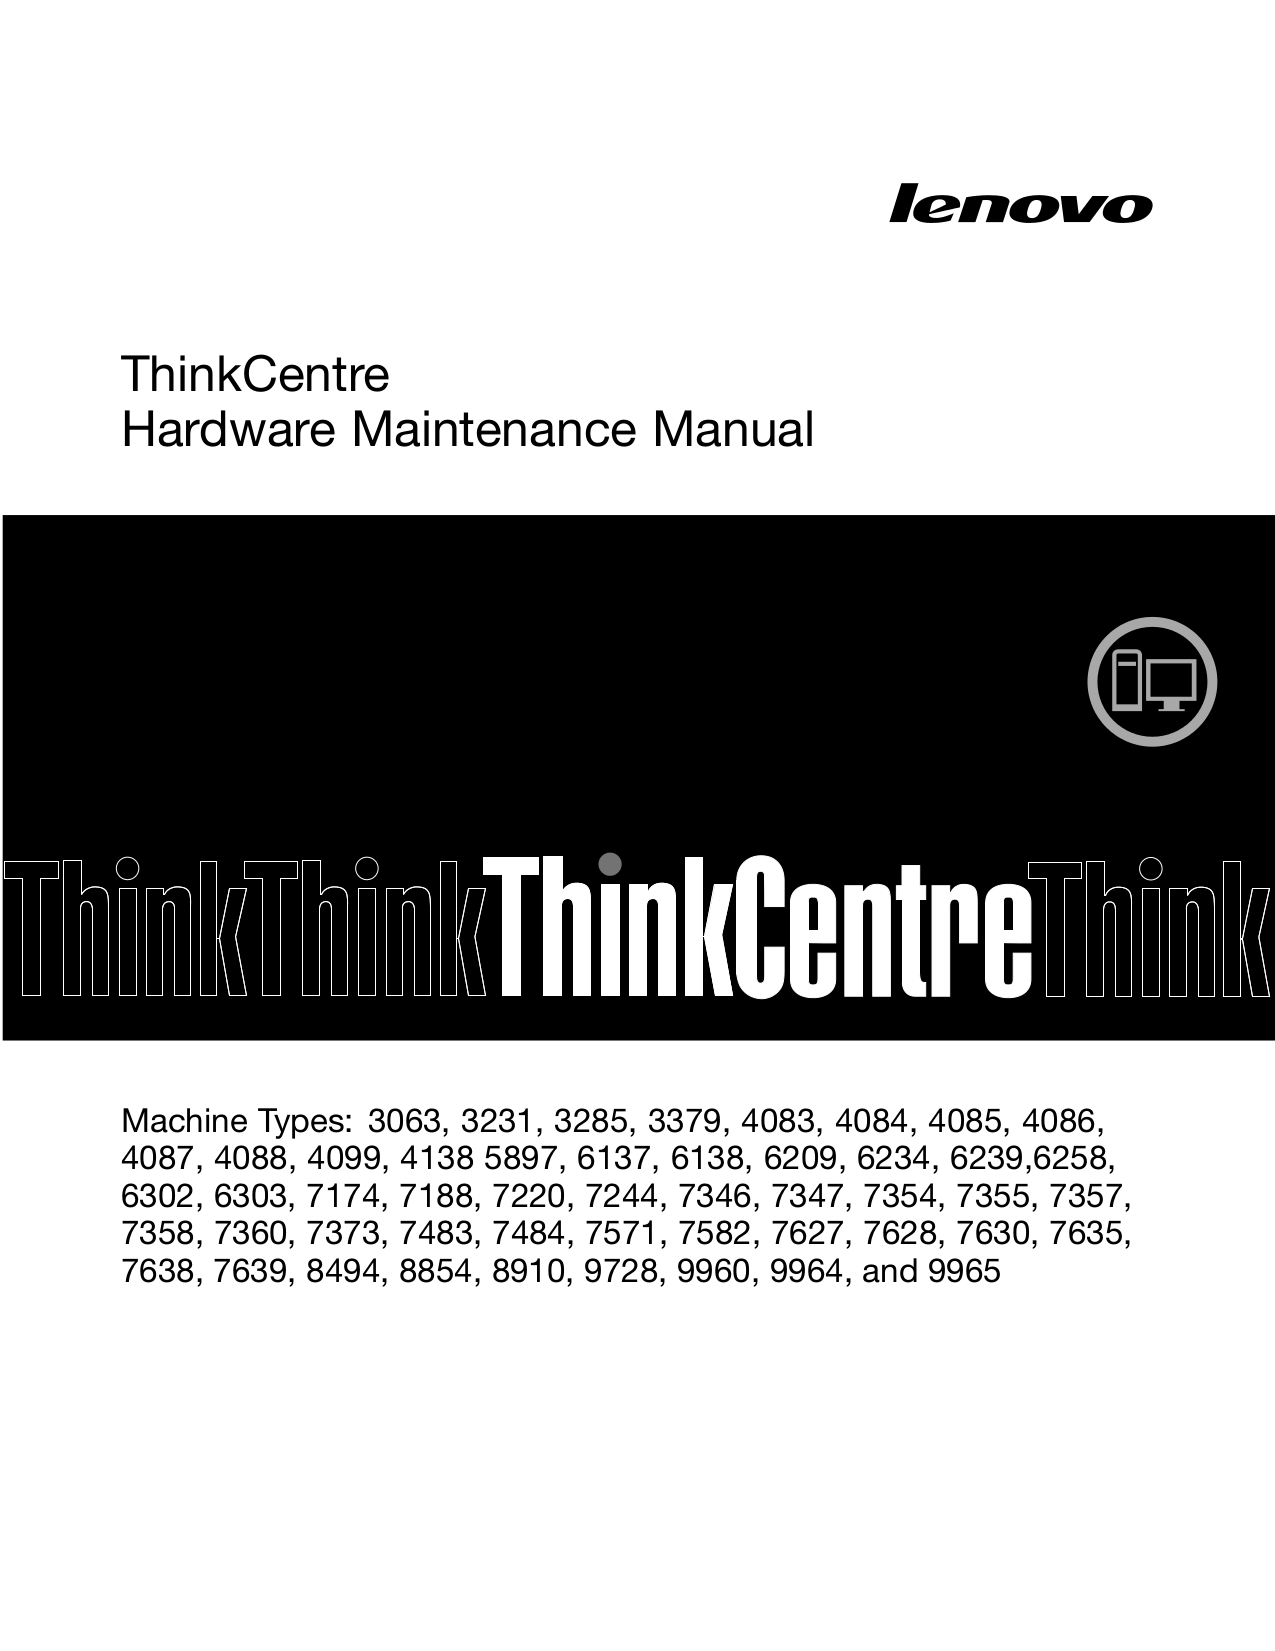 pdf for Lenovo Desktop ThinkCentre M58p 7635 manual